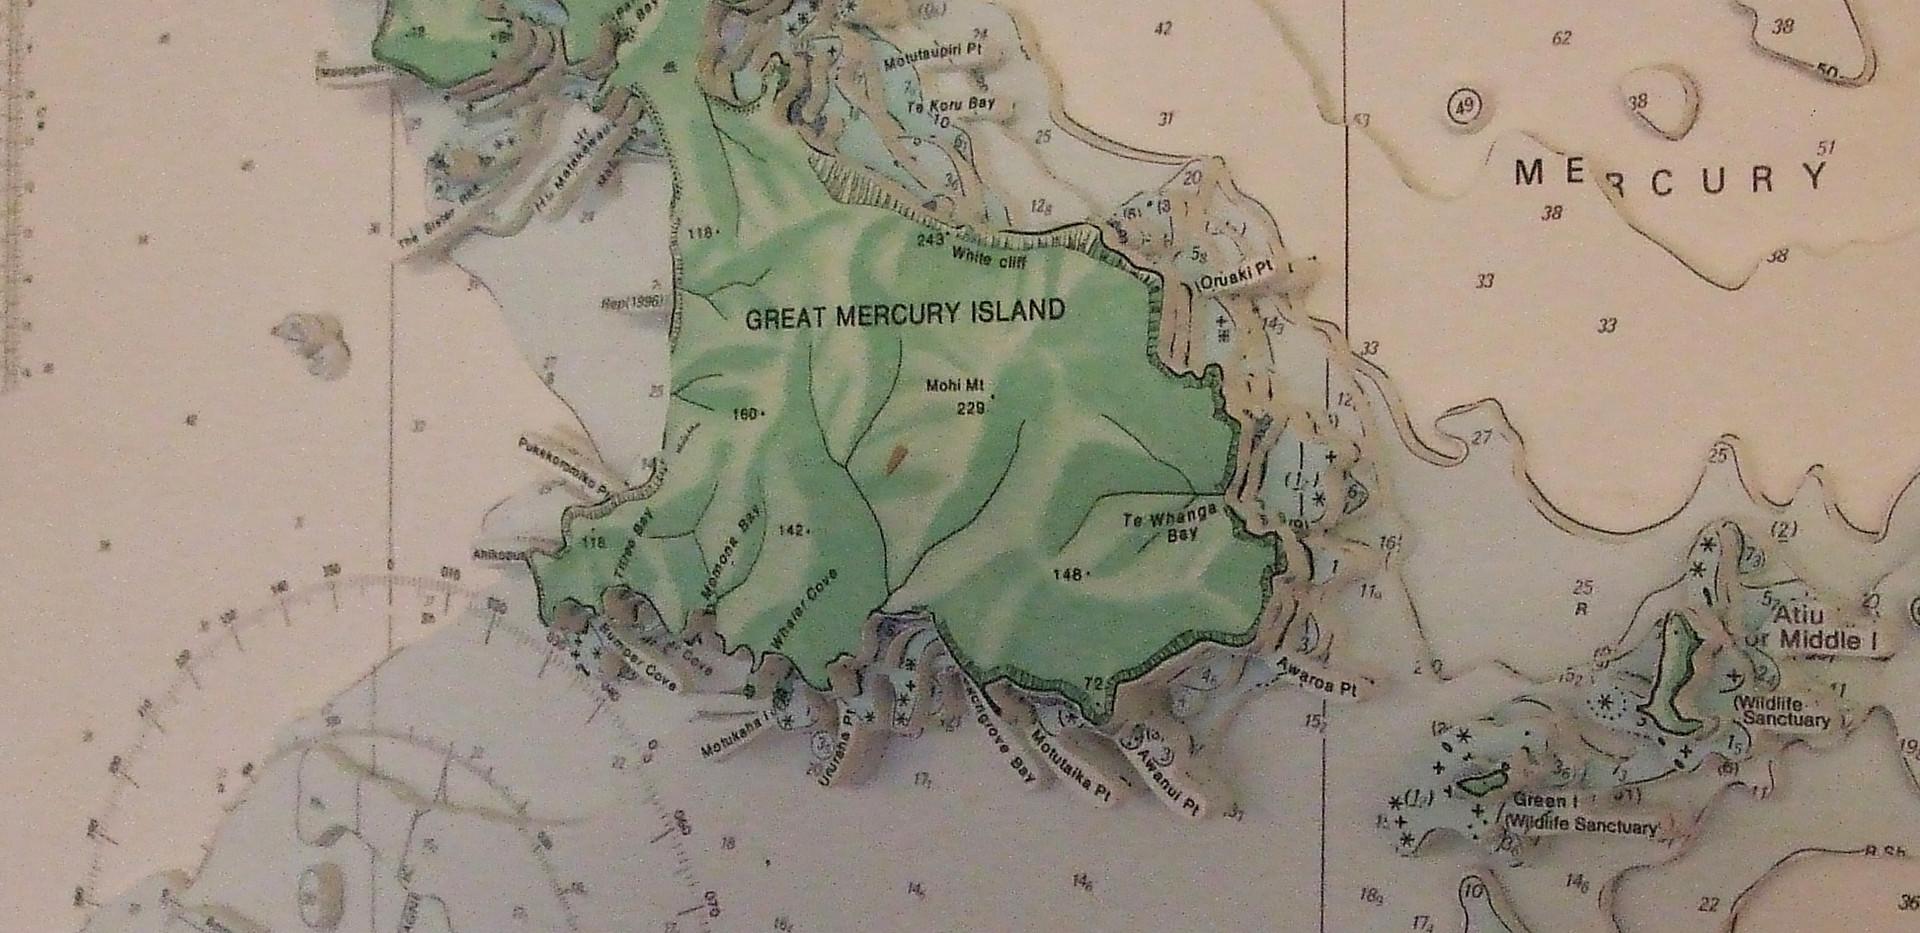 Mercury Island 2.jpg